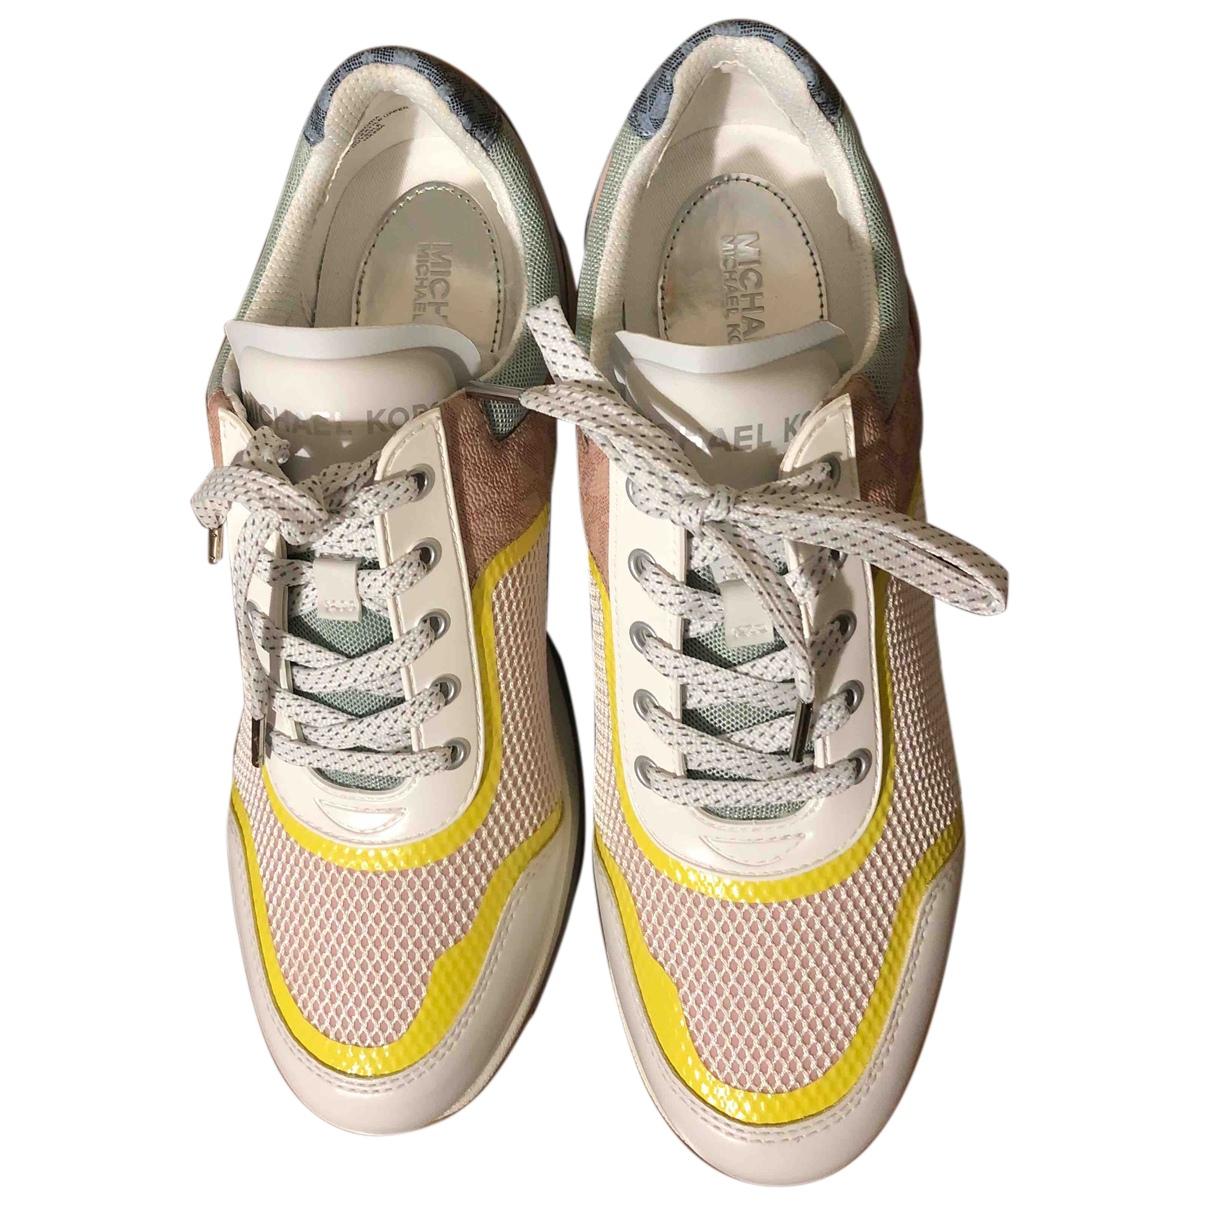 Michael Kors \N Sneakers in  Bunt Leinen